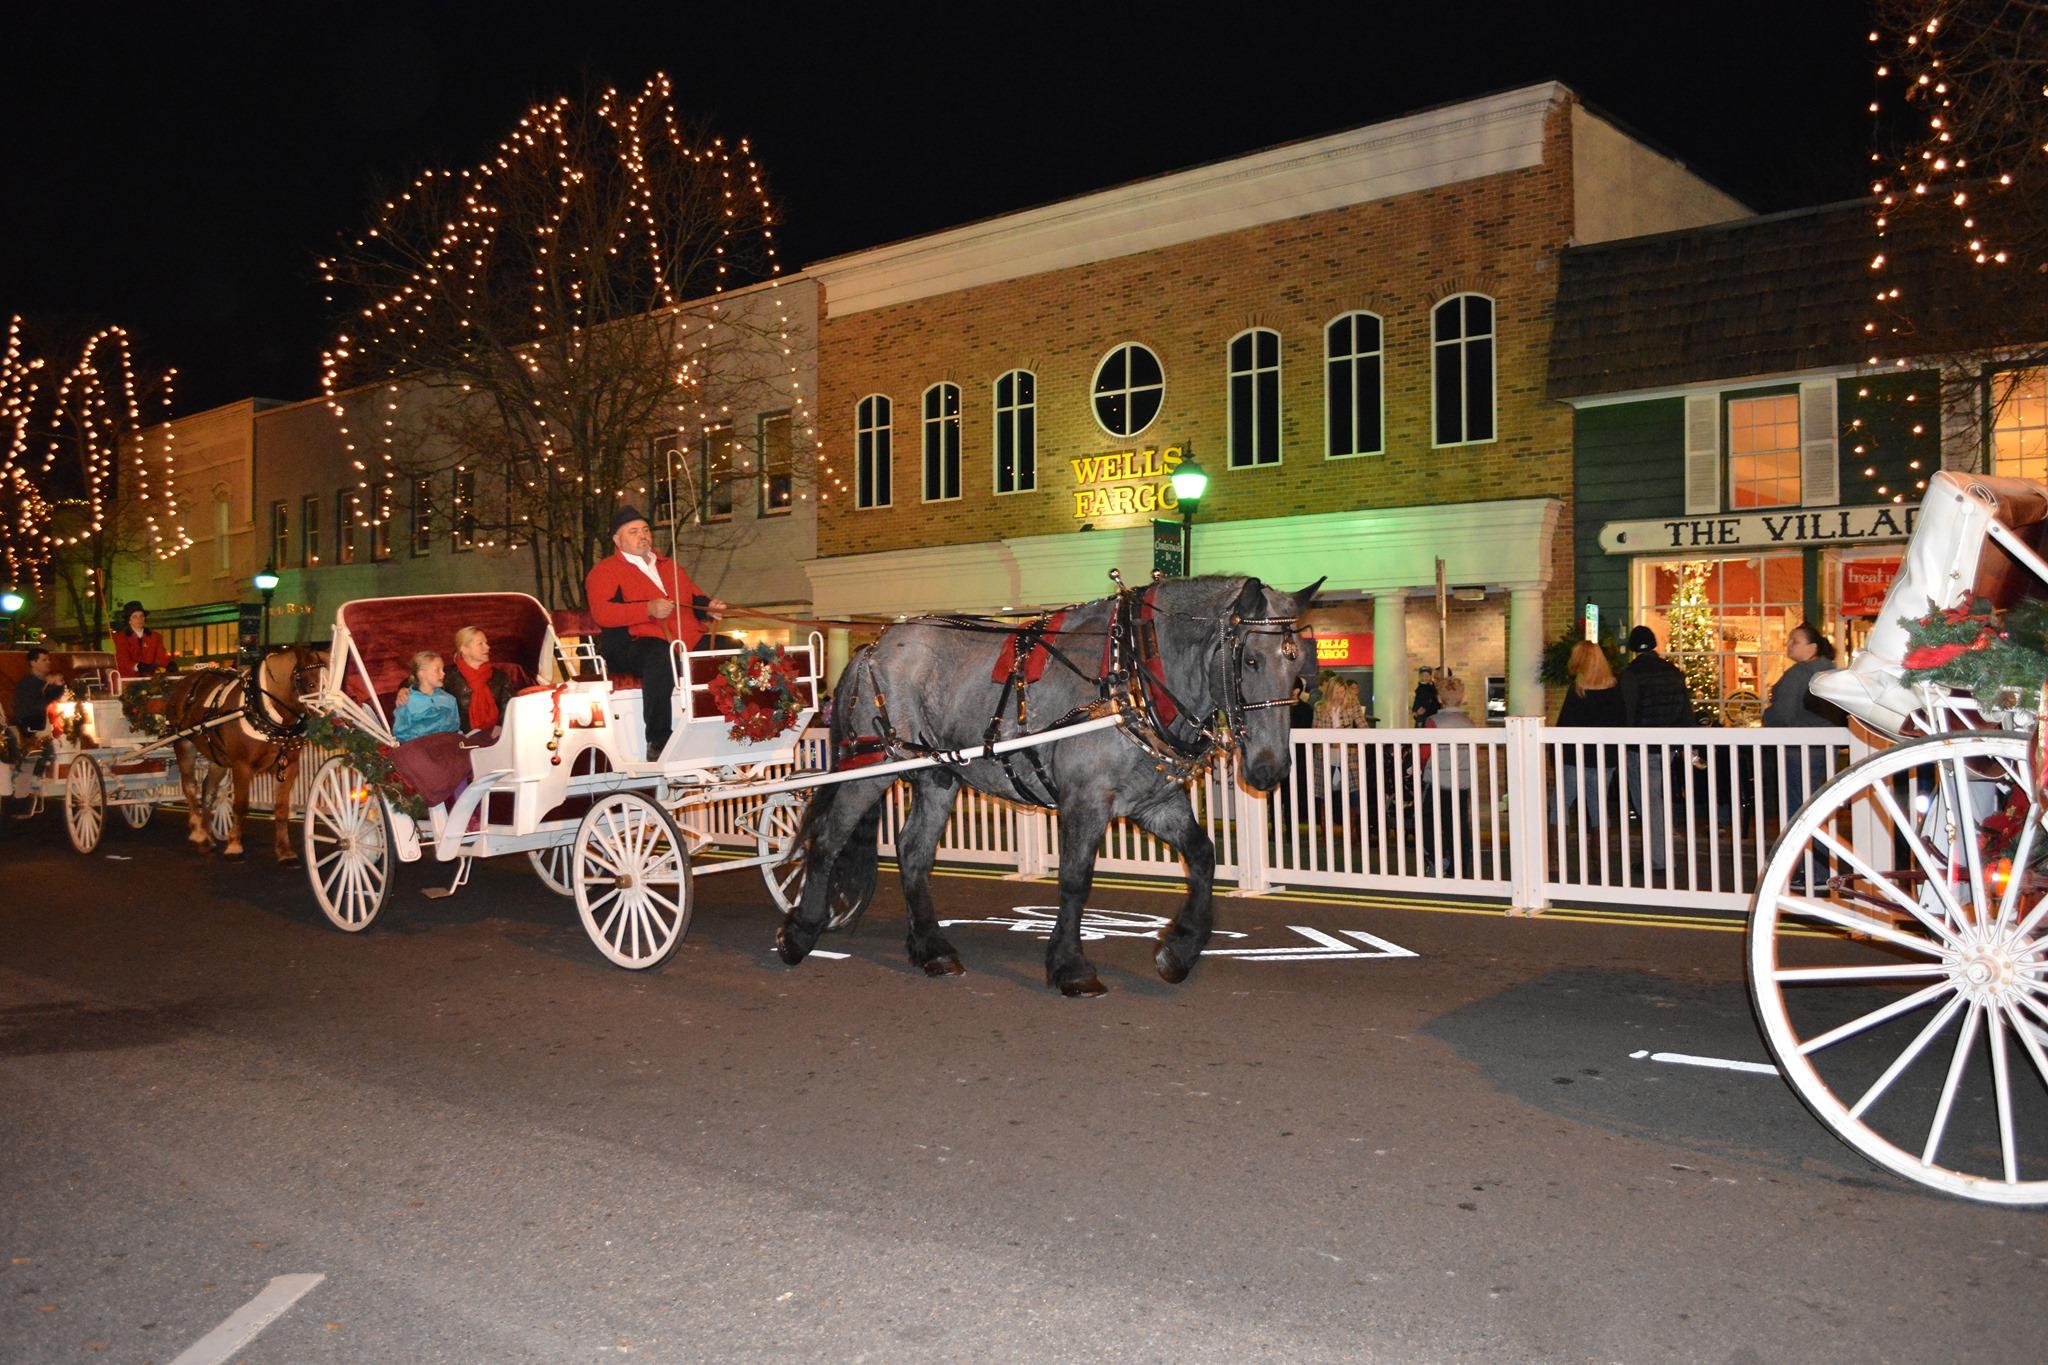 Image Courtesy: Town of Davidson